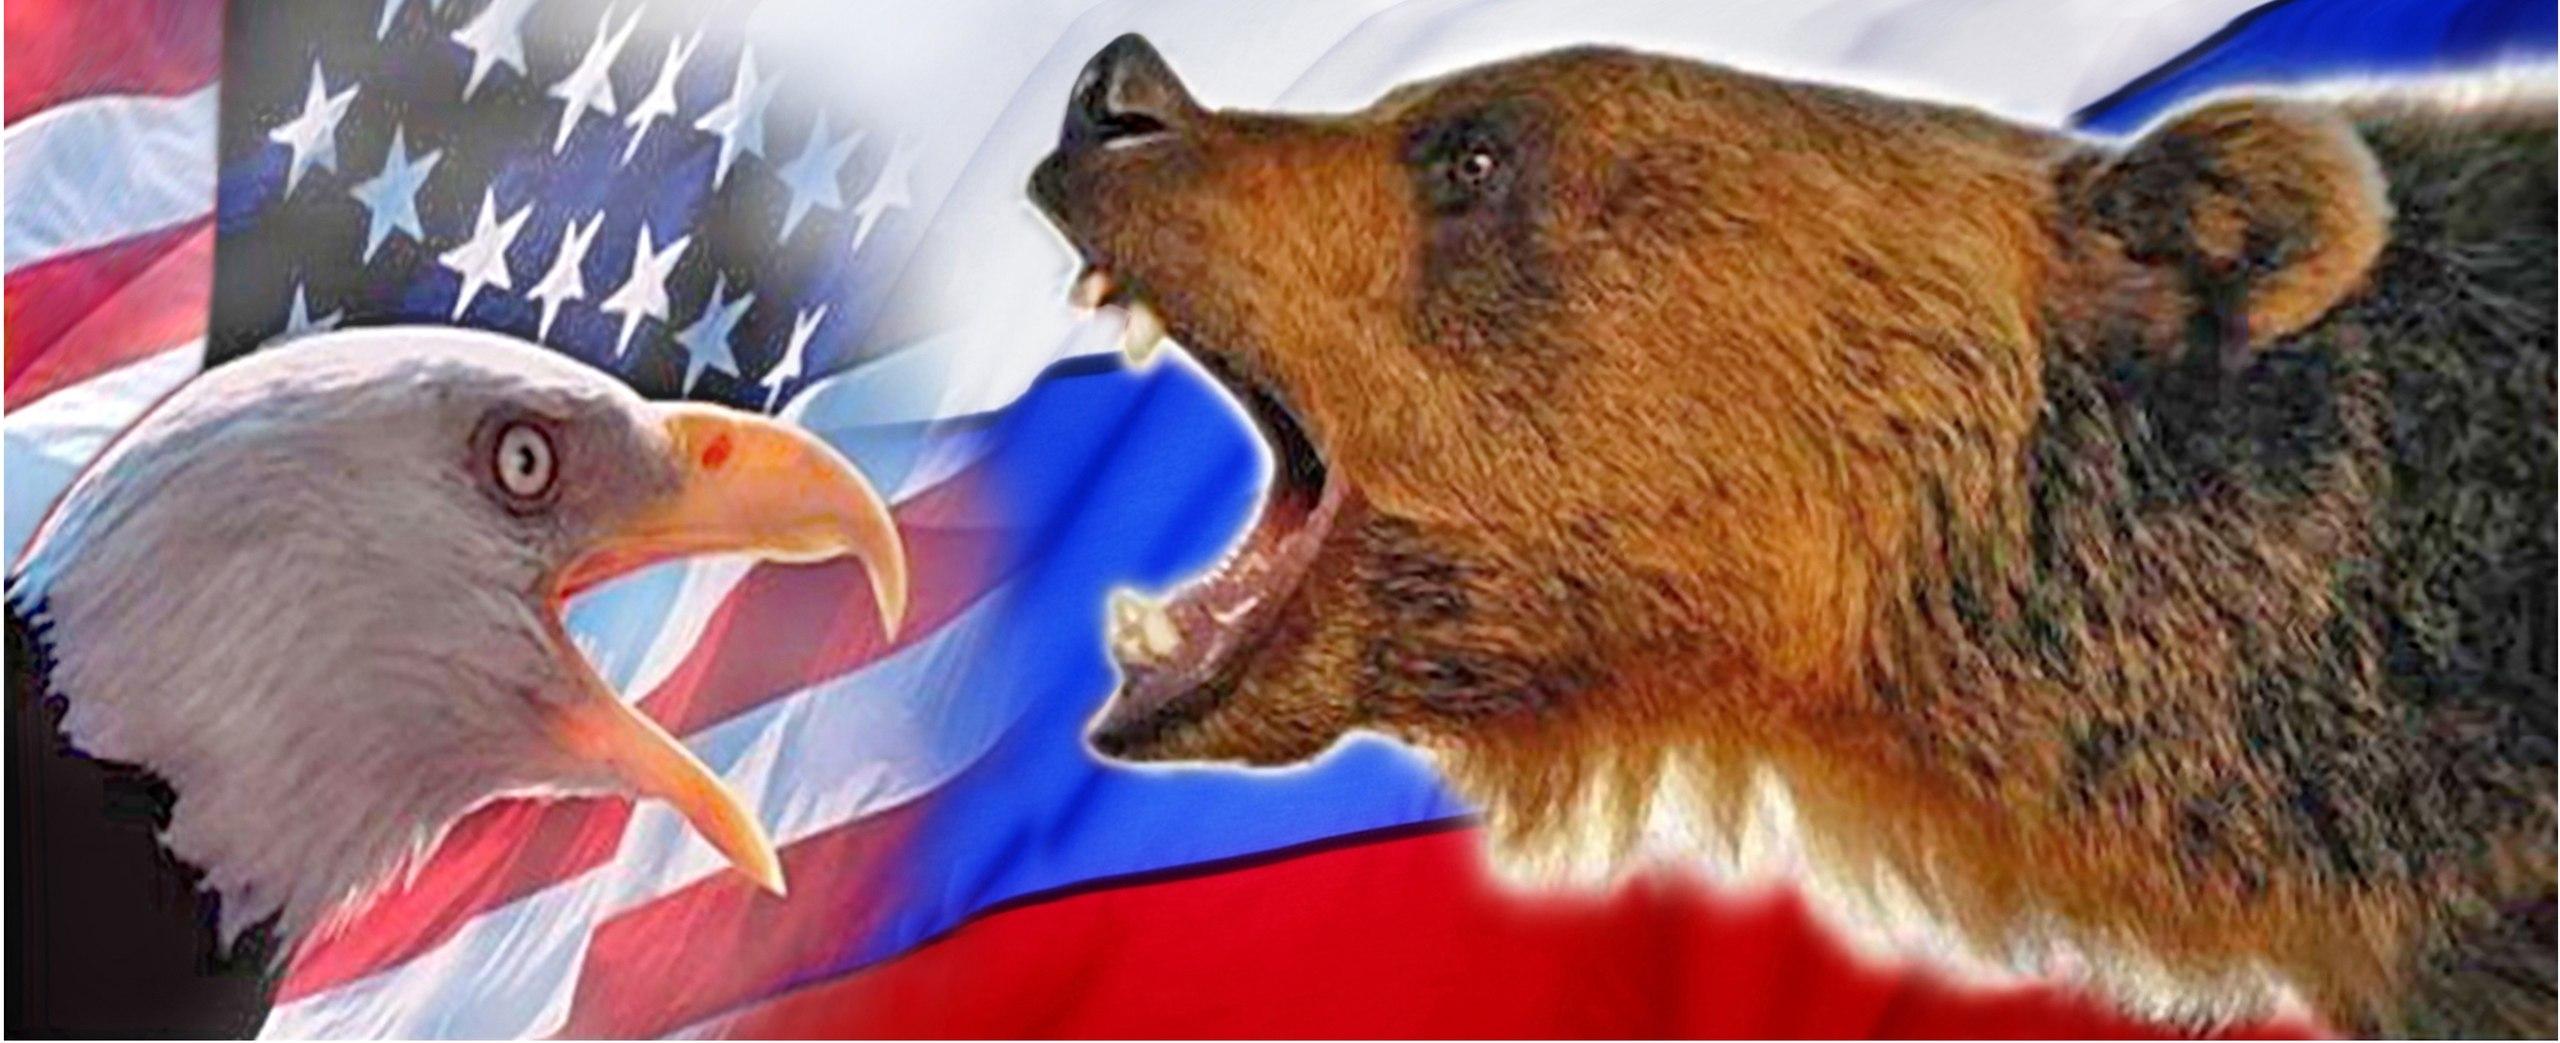 Россия против Америки фото-ის სურათის შედეგი